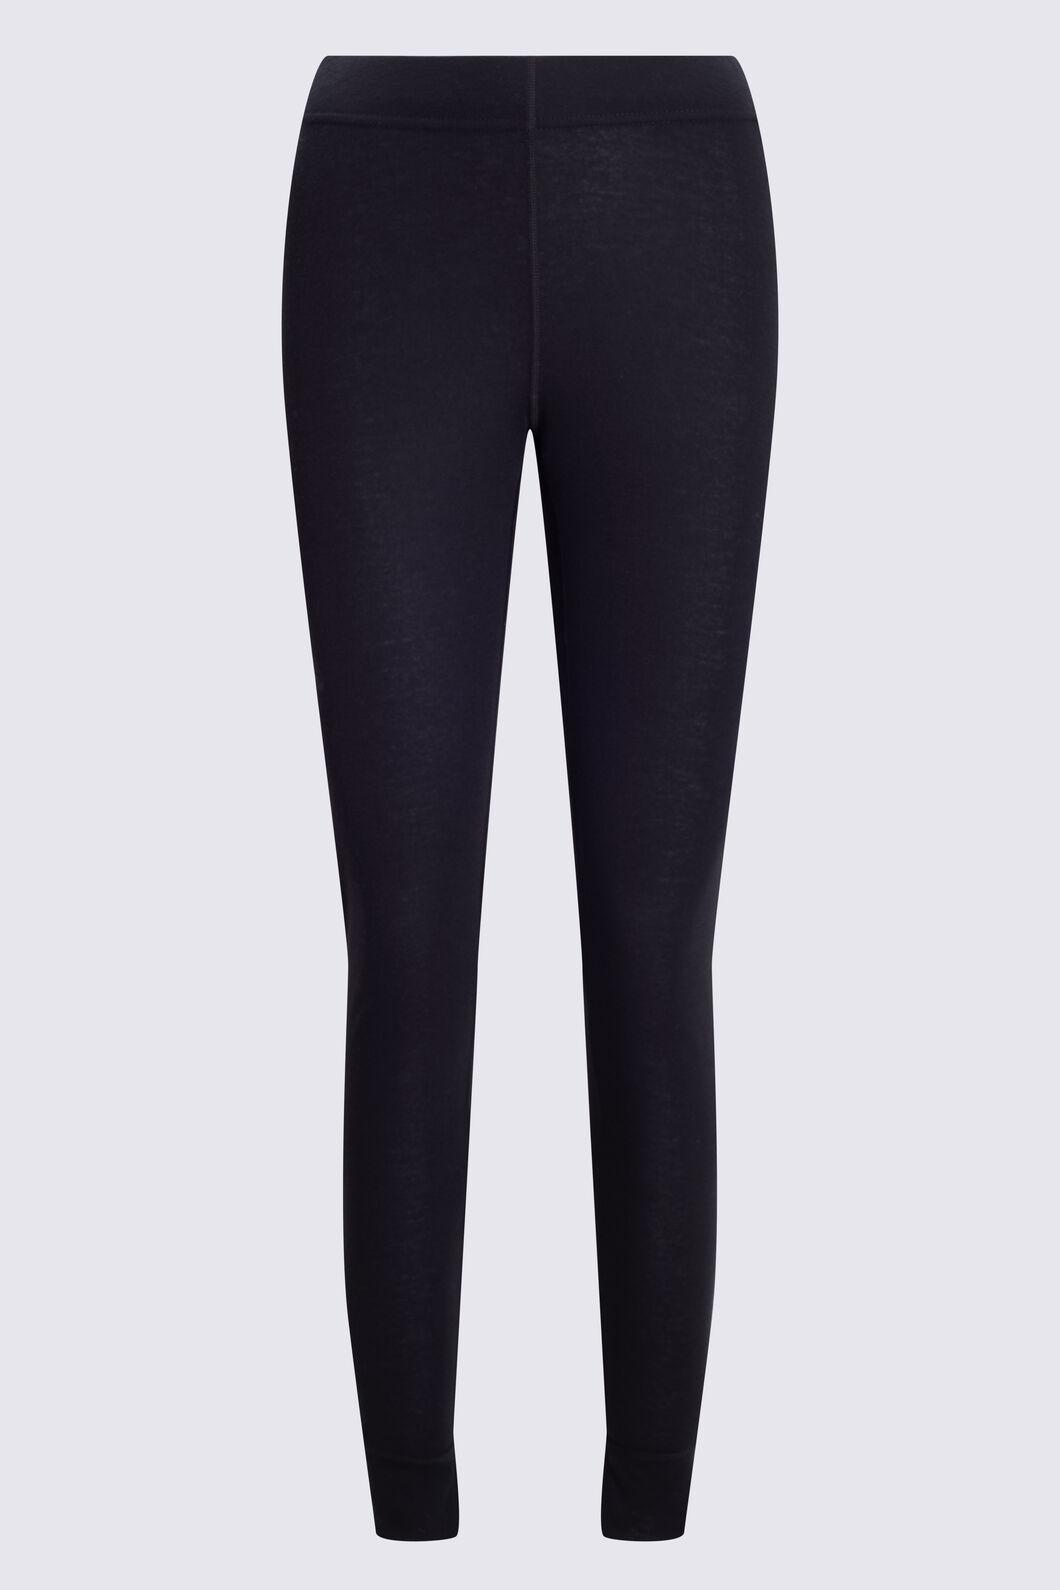 Macpac Women's Geothermal Pants, Black, hi-res